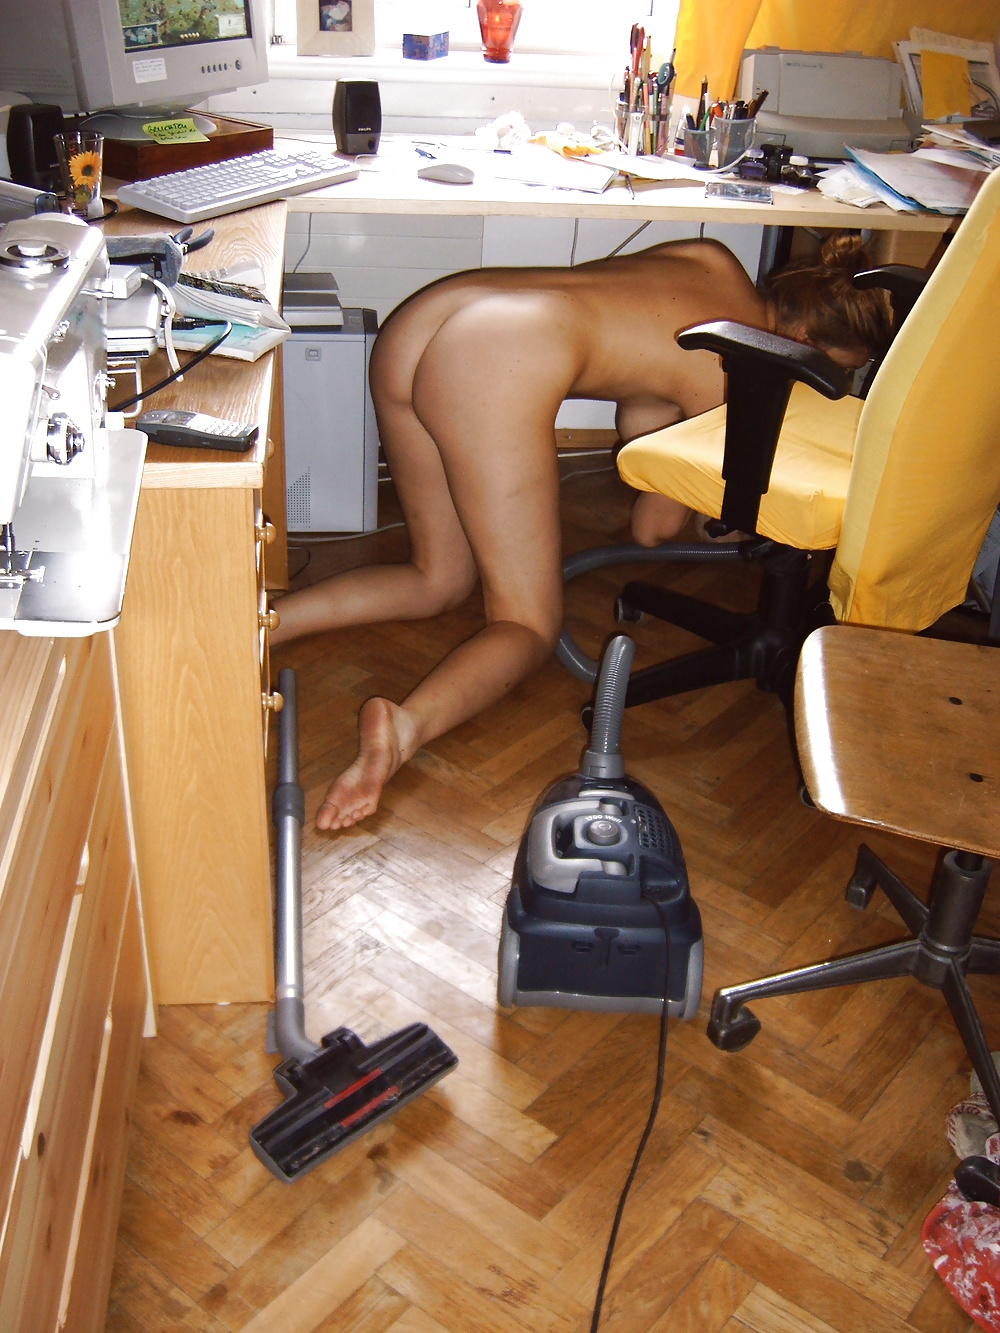 Эротика голые хозяйки наводят уборку дома видео, порно видео мужчина женщина